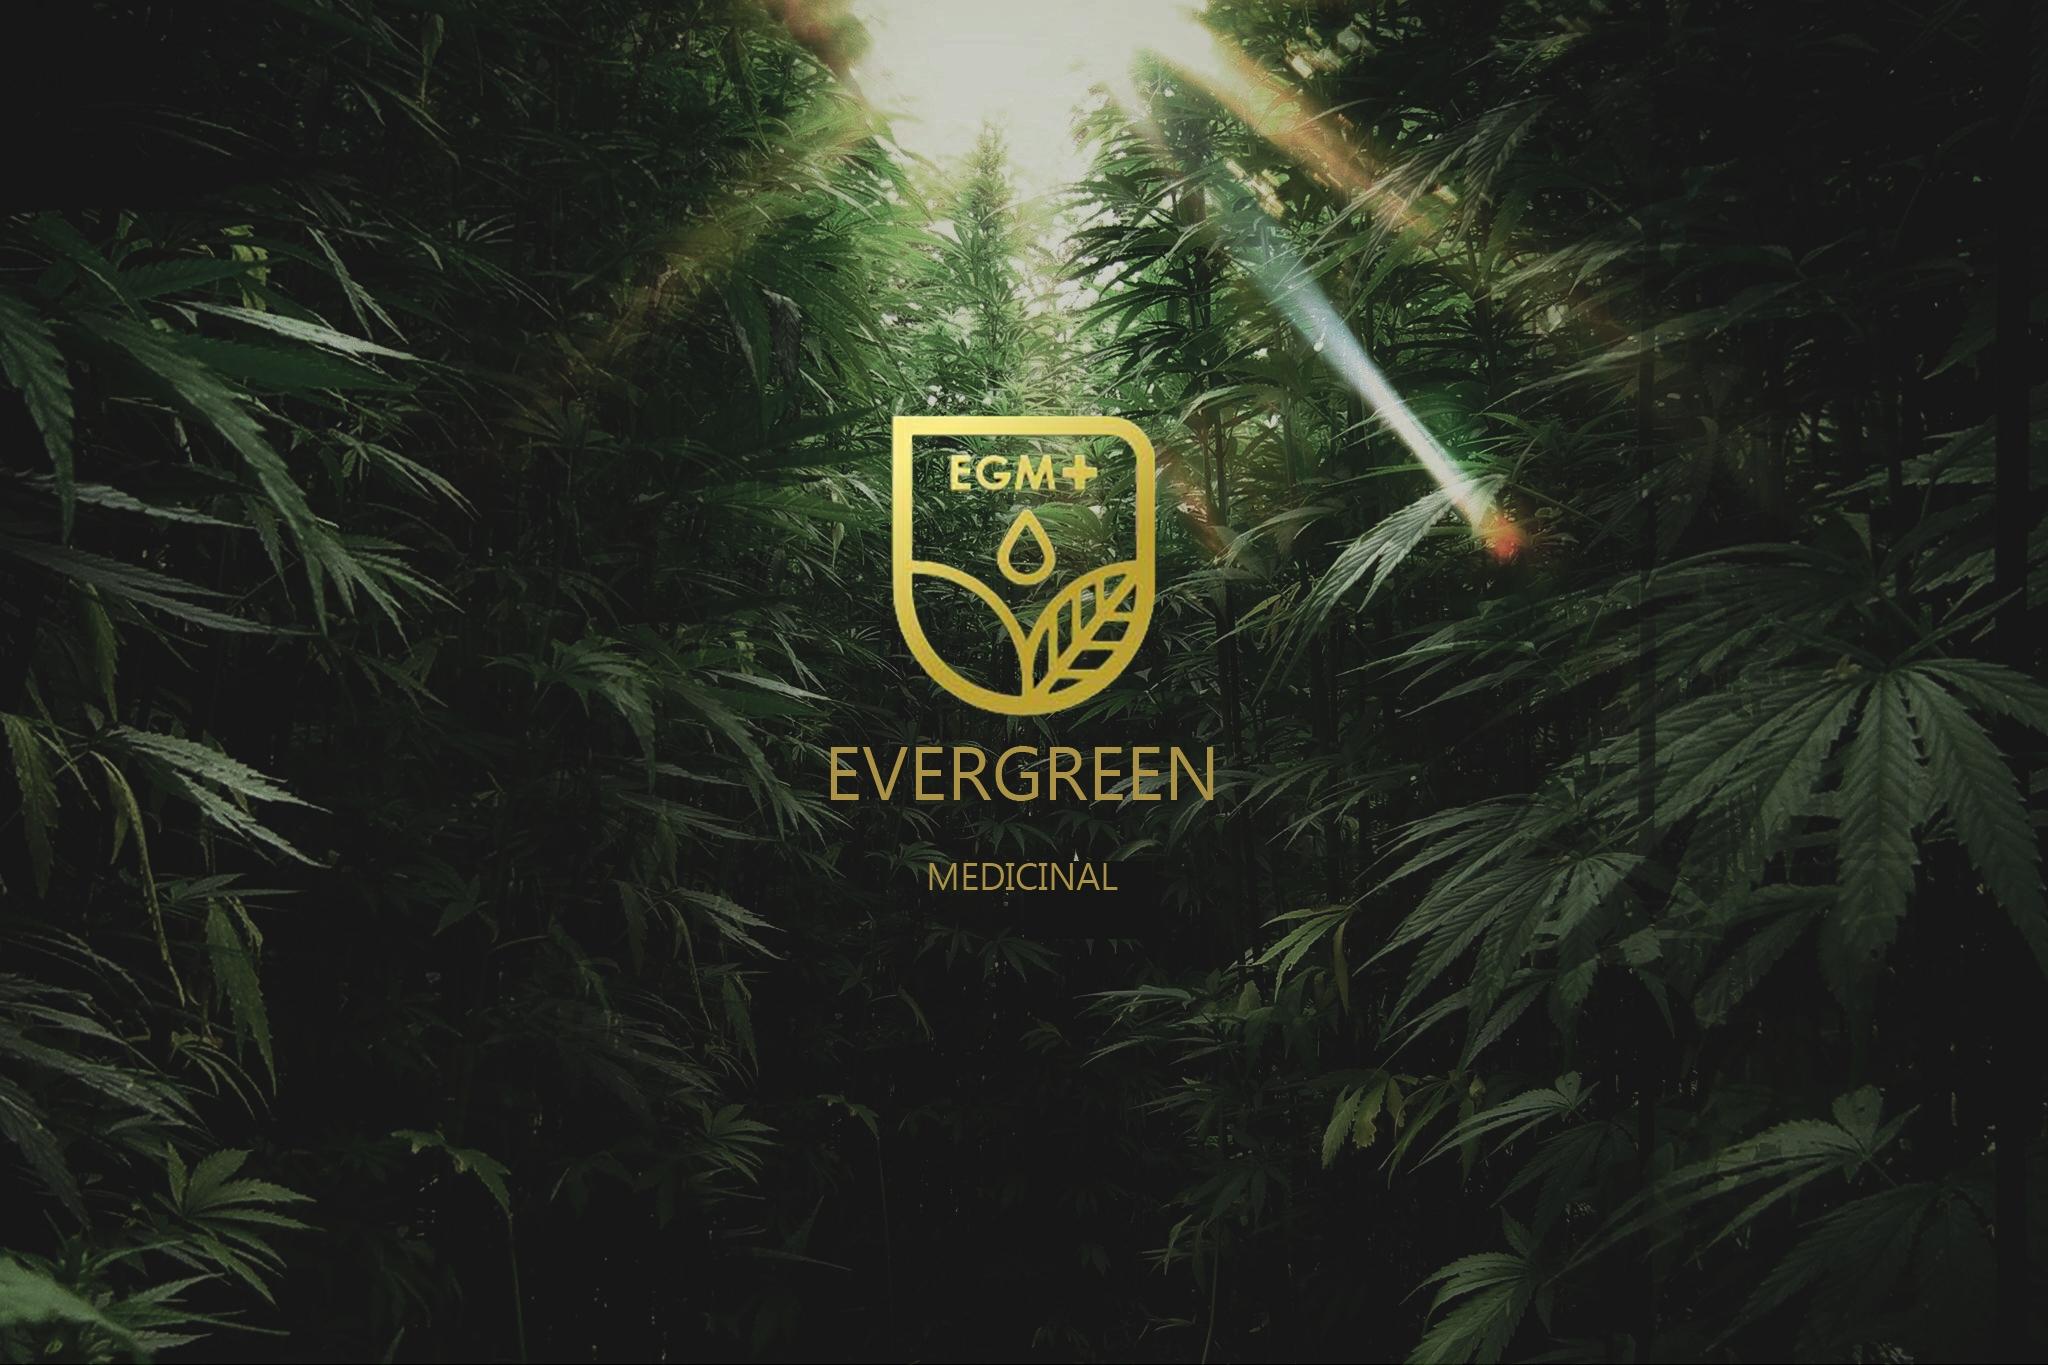 EG medicinal Online (@egmedicinalca) Cover Image